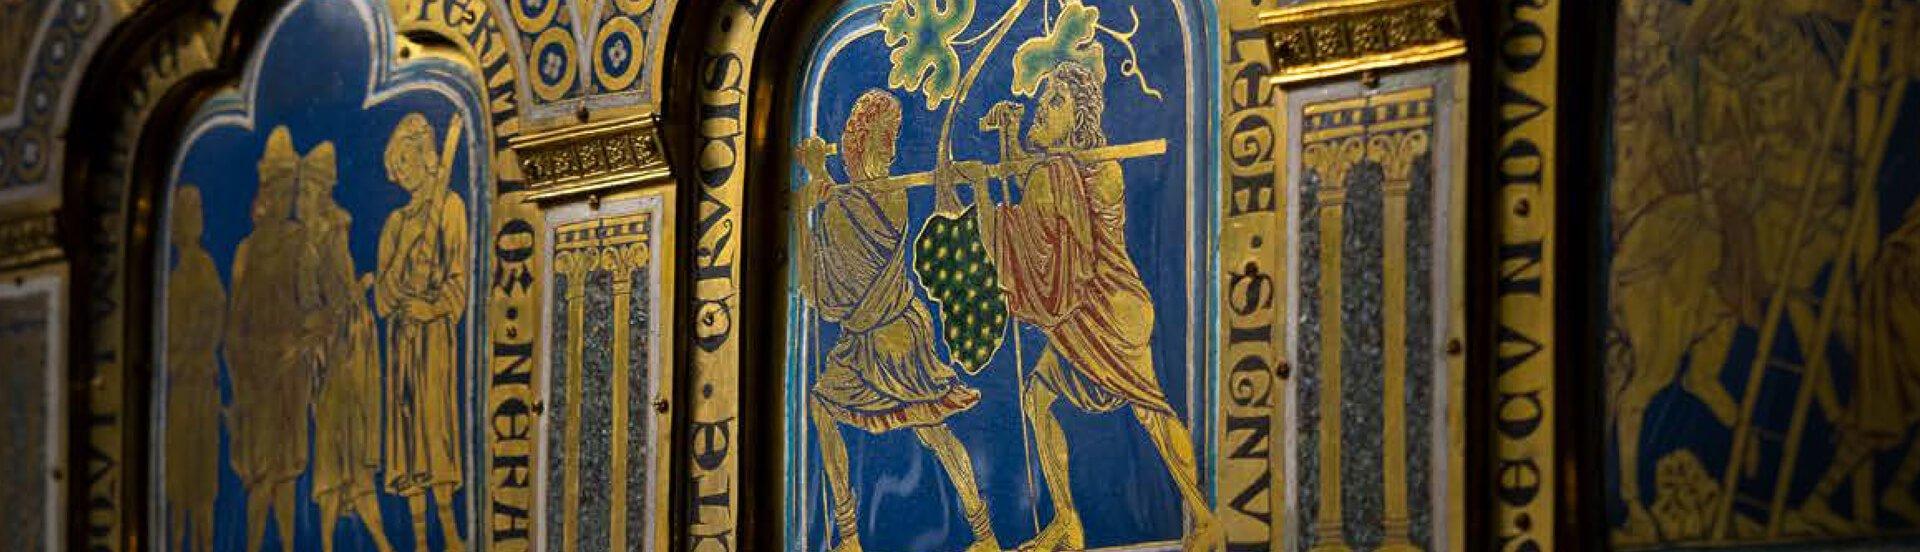 Detail aus dem Verduner Altar